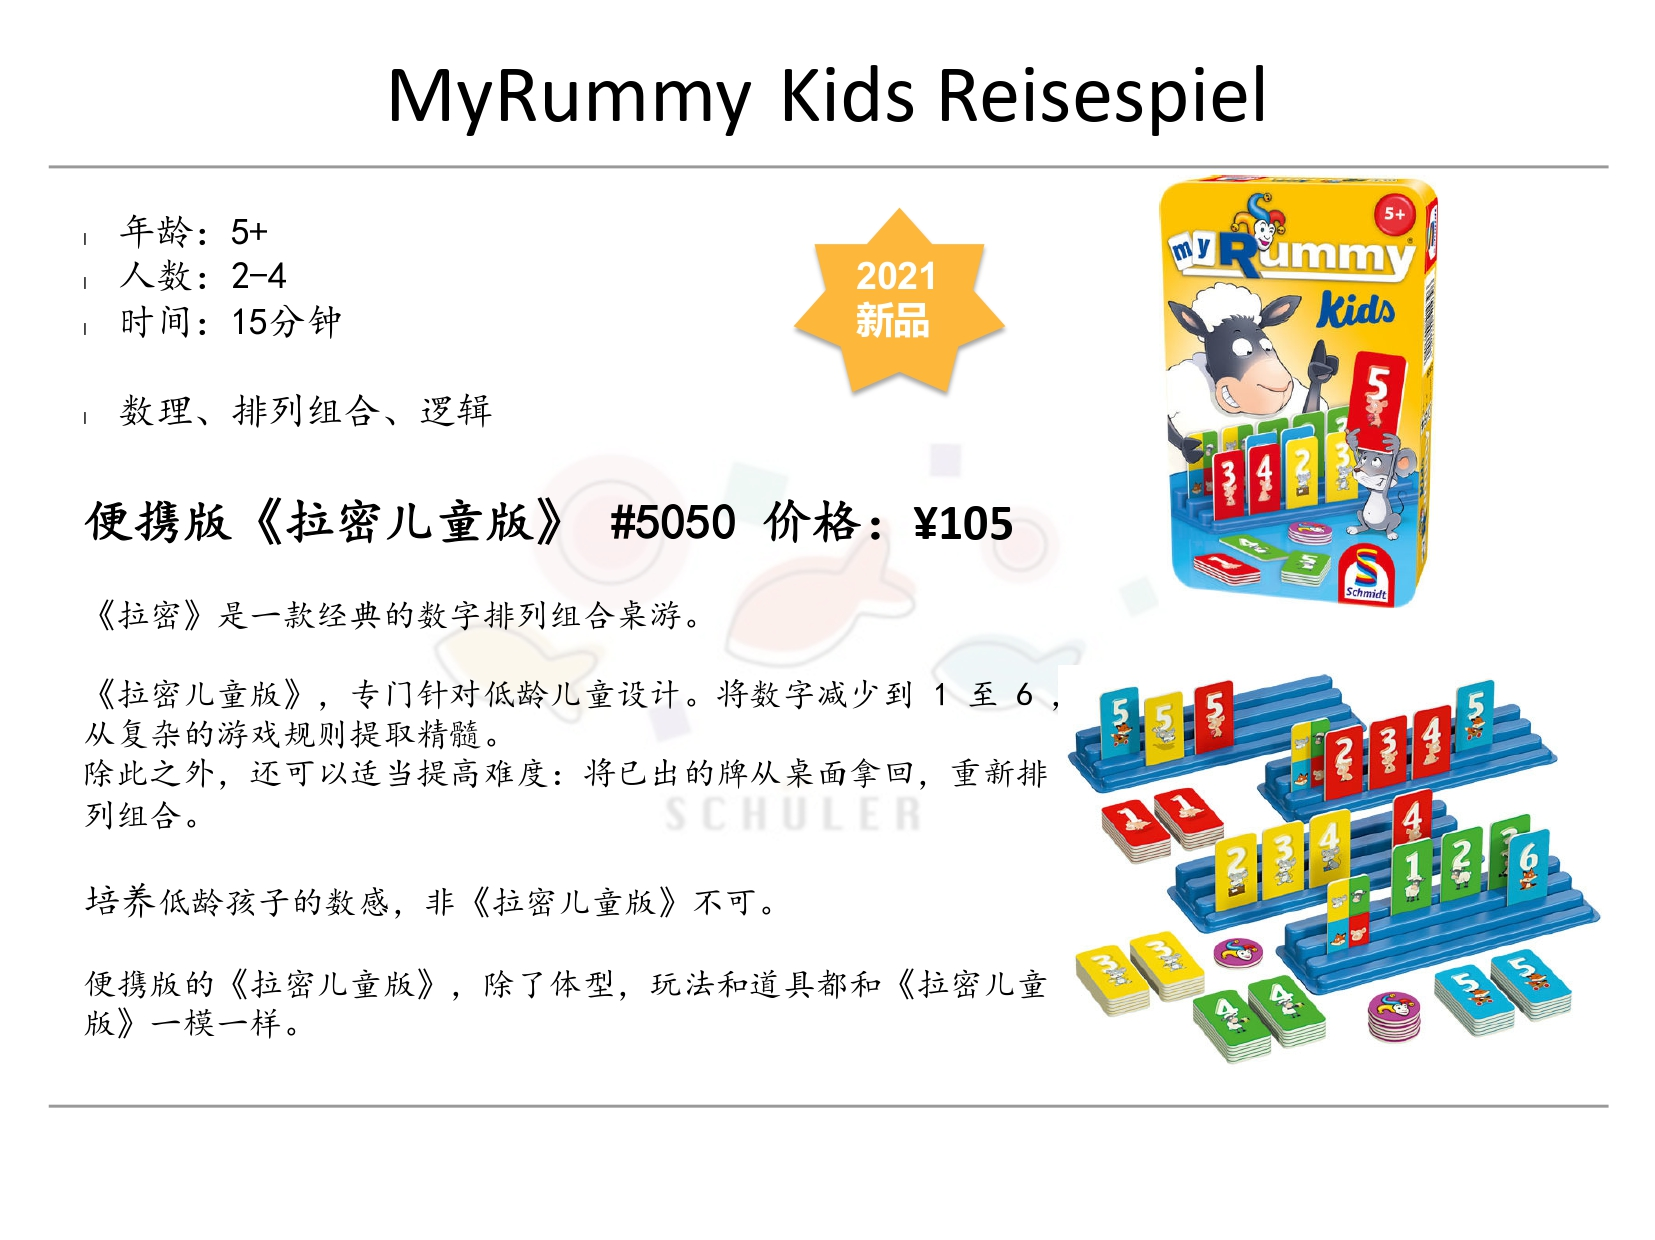 MyRummy Kids Reisespiel 拉密儿童版便携装